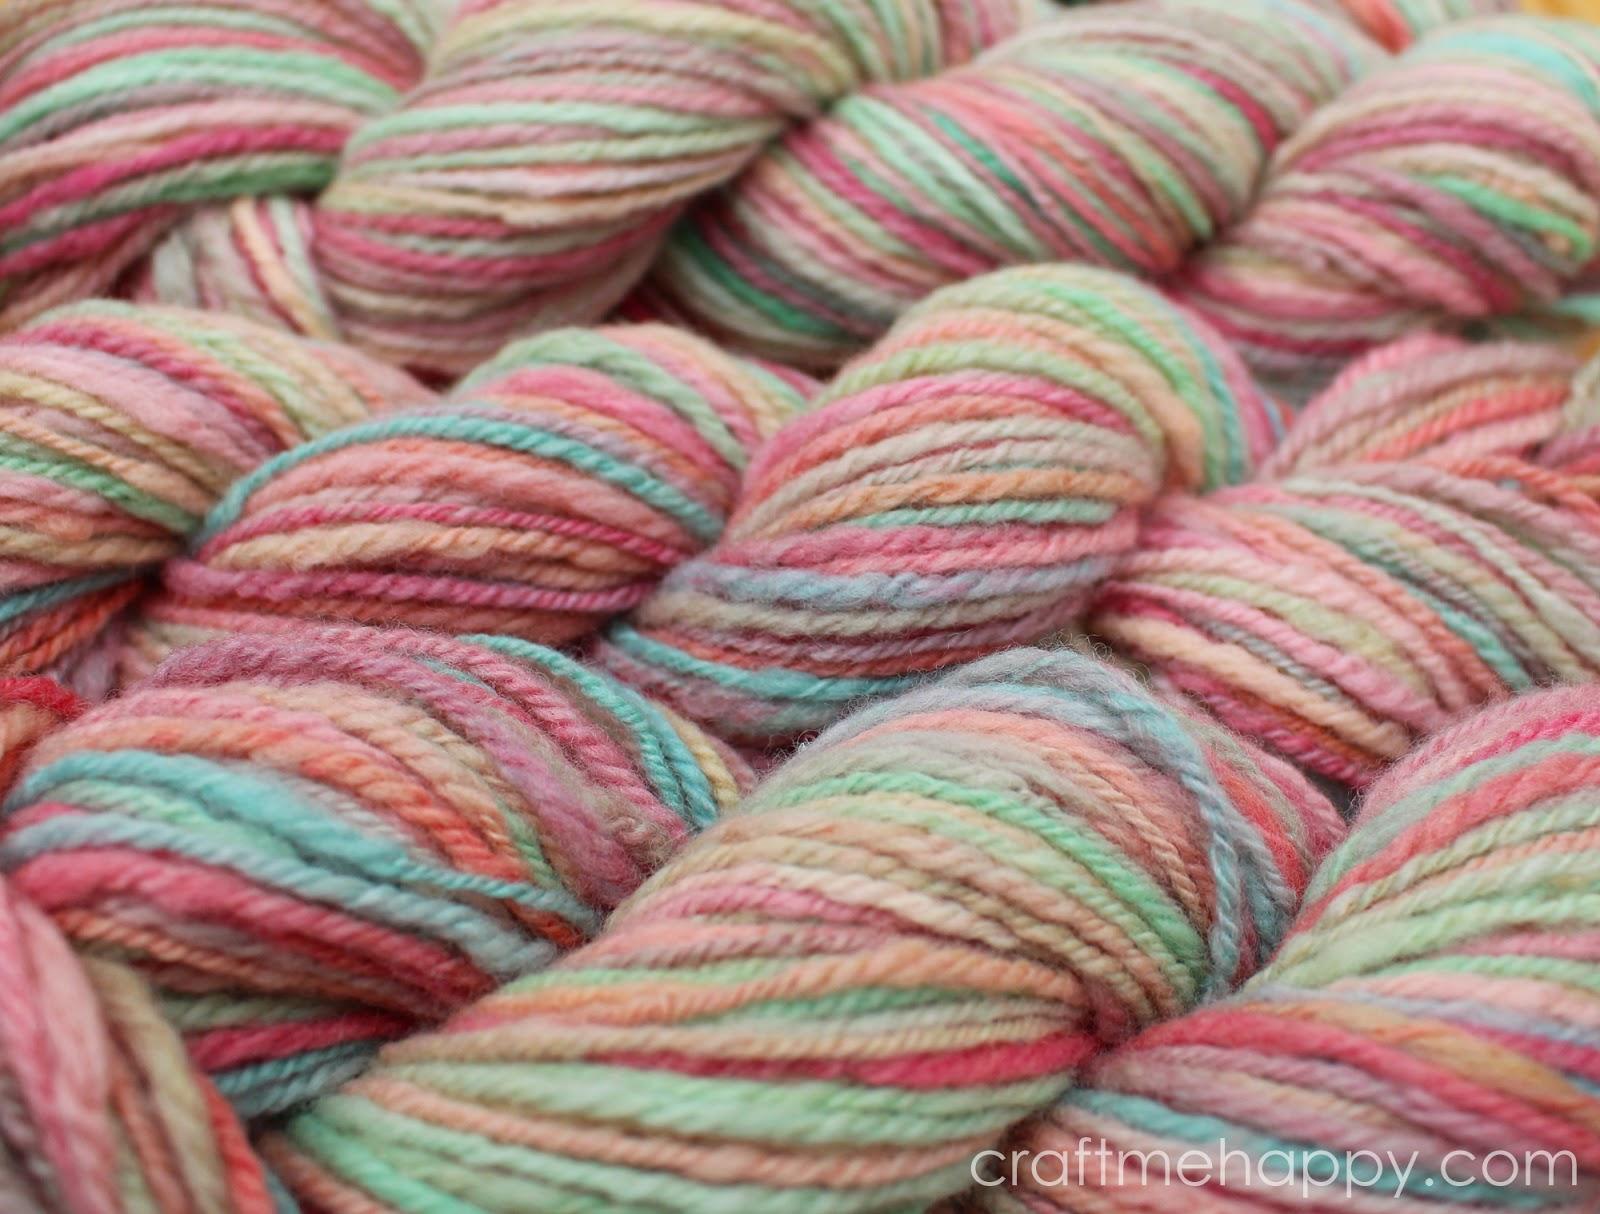 Knitted Bouclé Stitch | Craft me Happy!: Knitted Bouclé Stitch